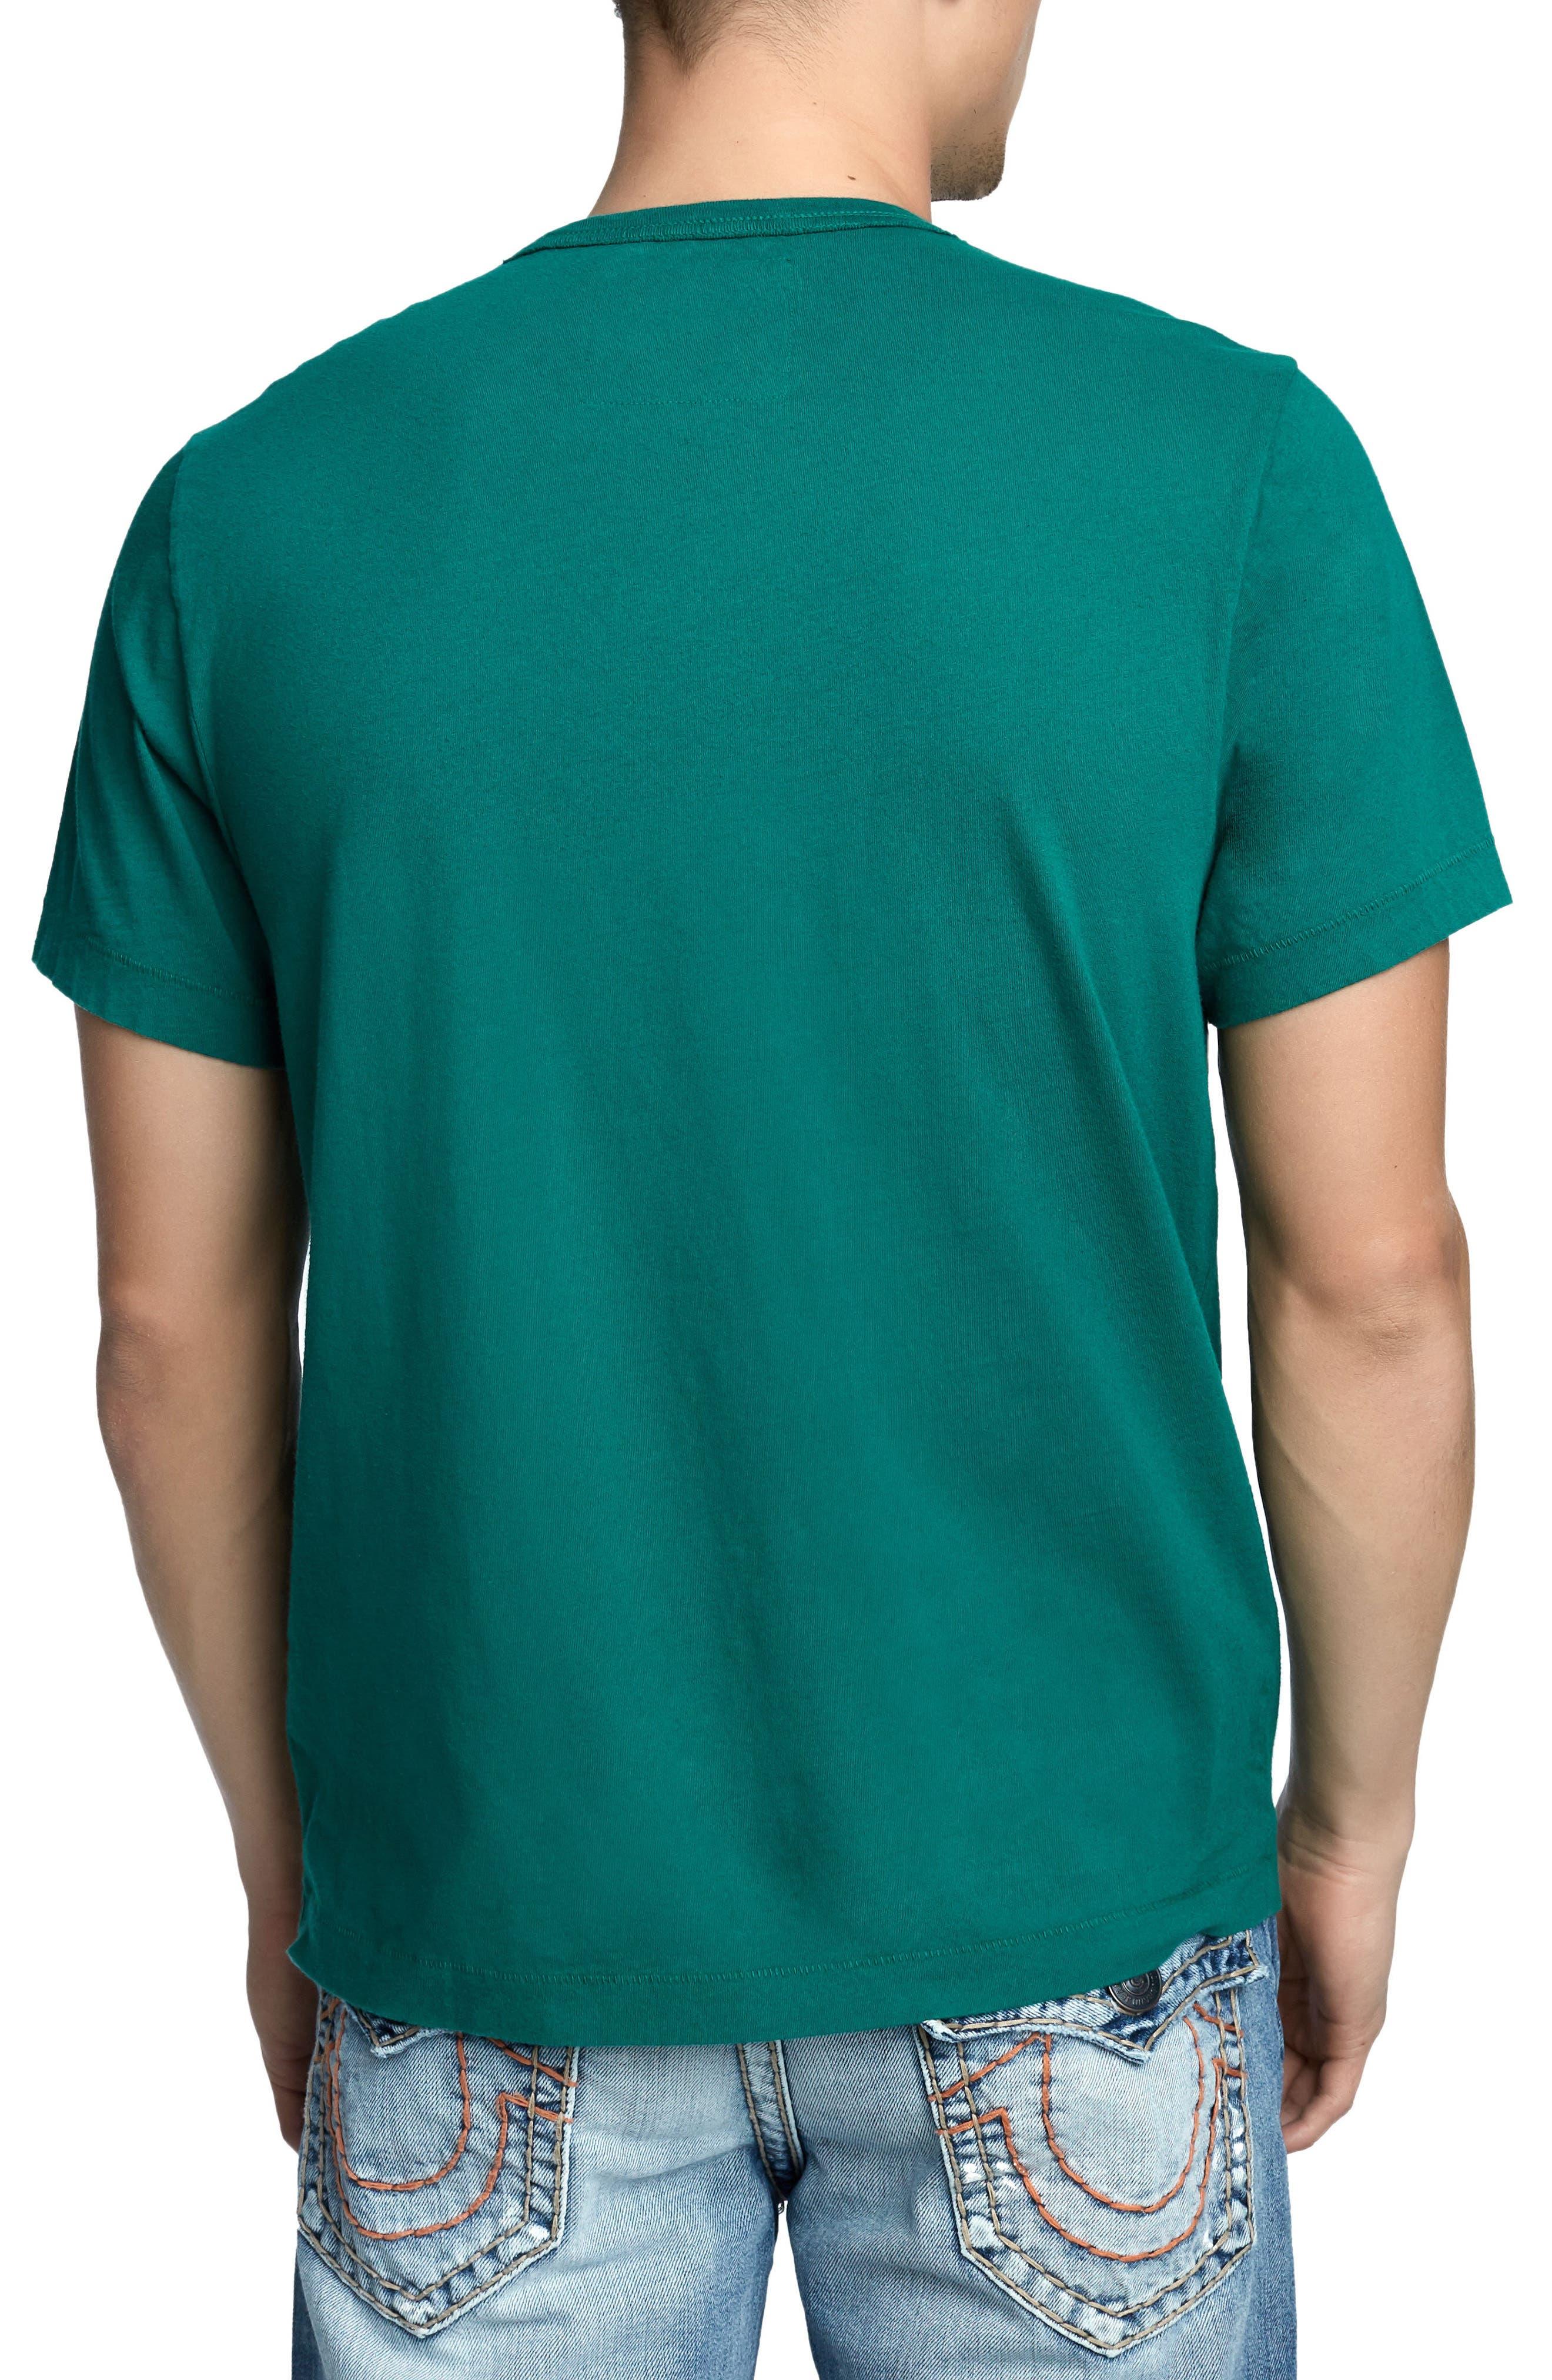 True Slogan T-Shirt,                             Alternate thumbnail 2, color,                             DARK AGAVE